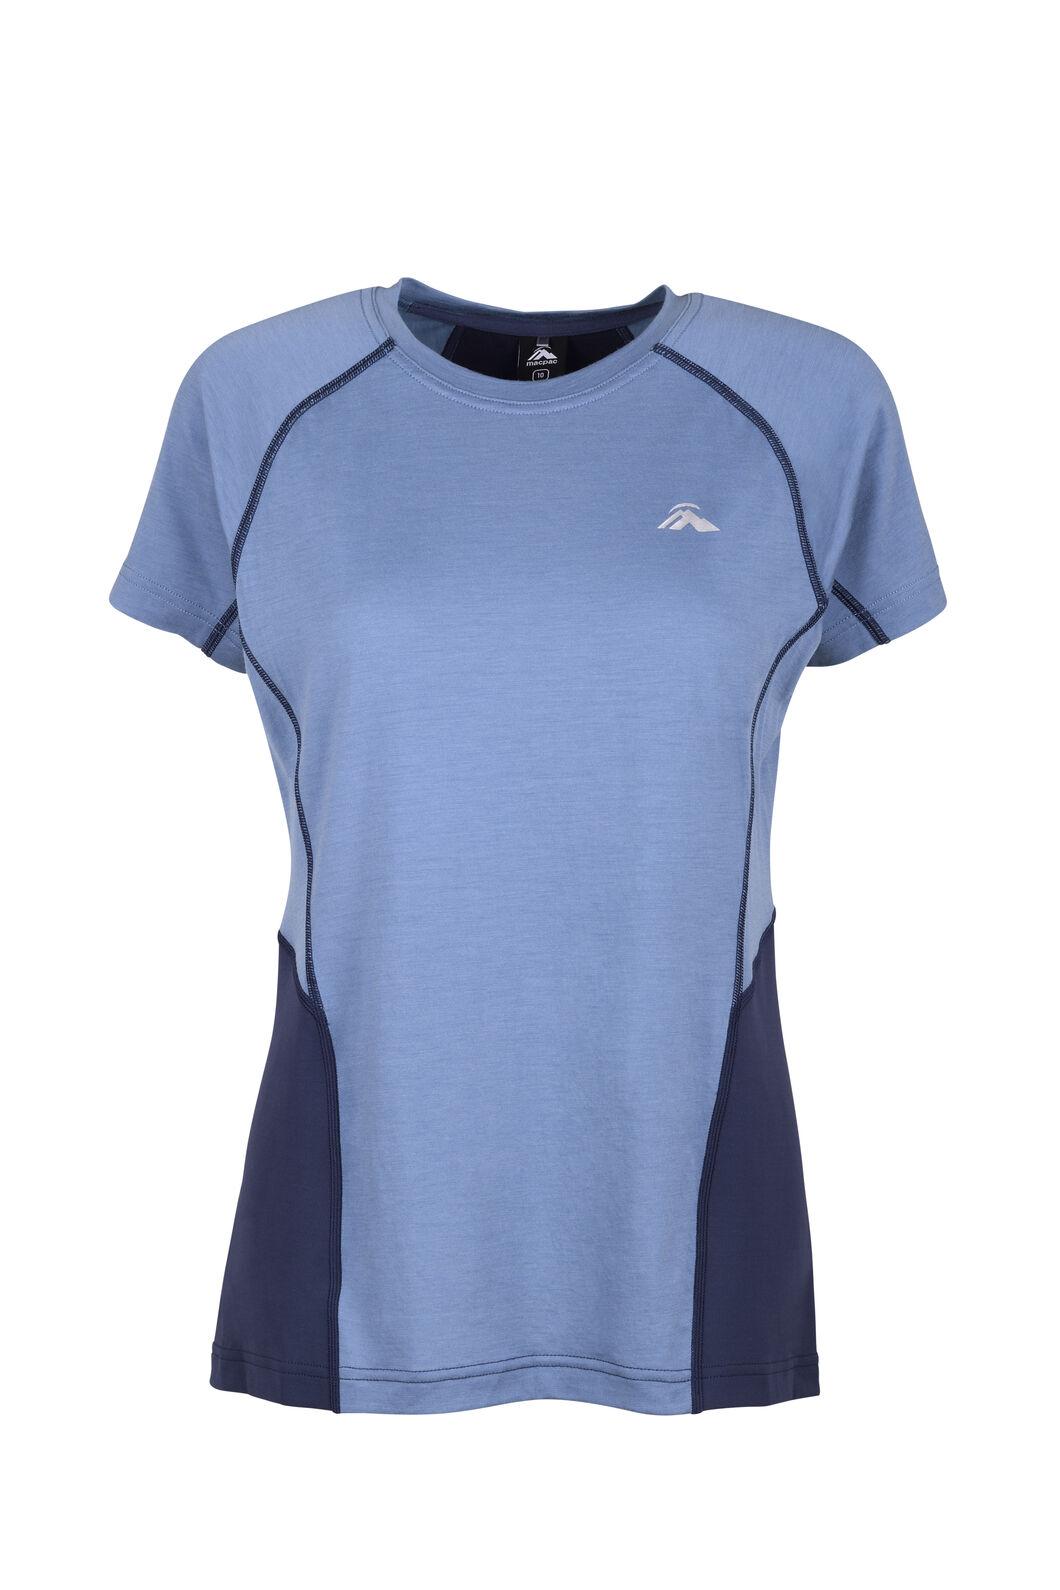 Macpac Casswell Short Sleeve Crew — Women's, China Blue/Mood Indigo, hi-res